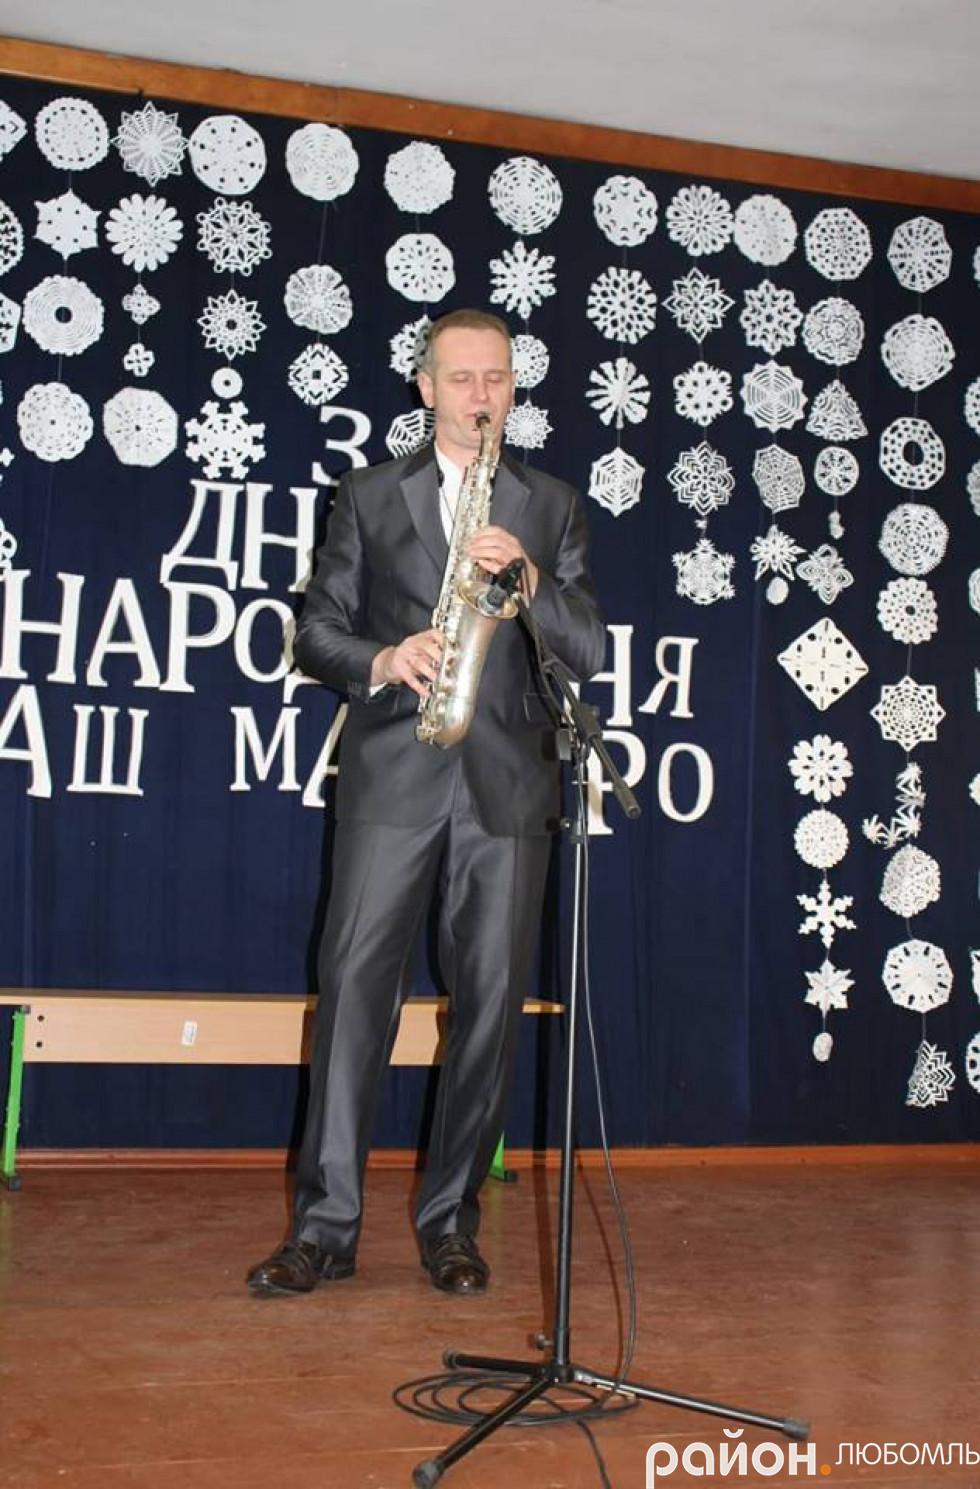 Юрій Шеменюк